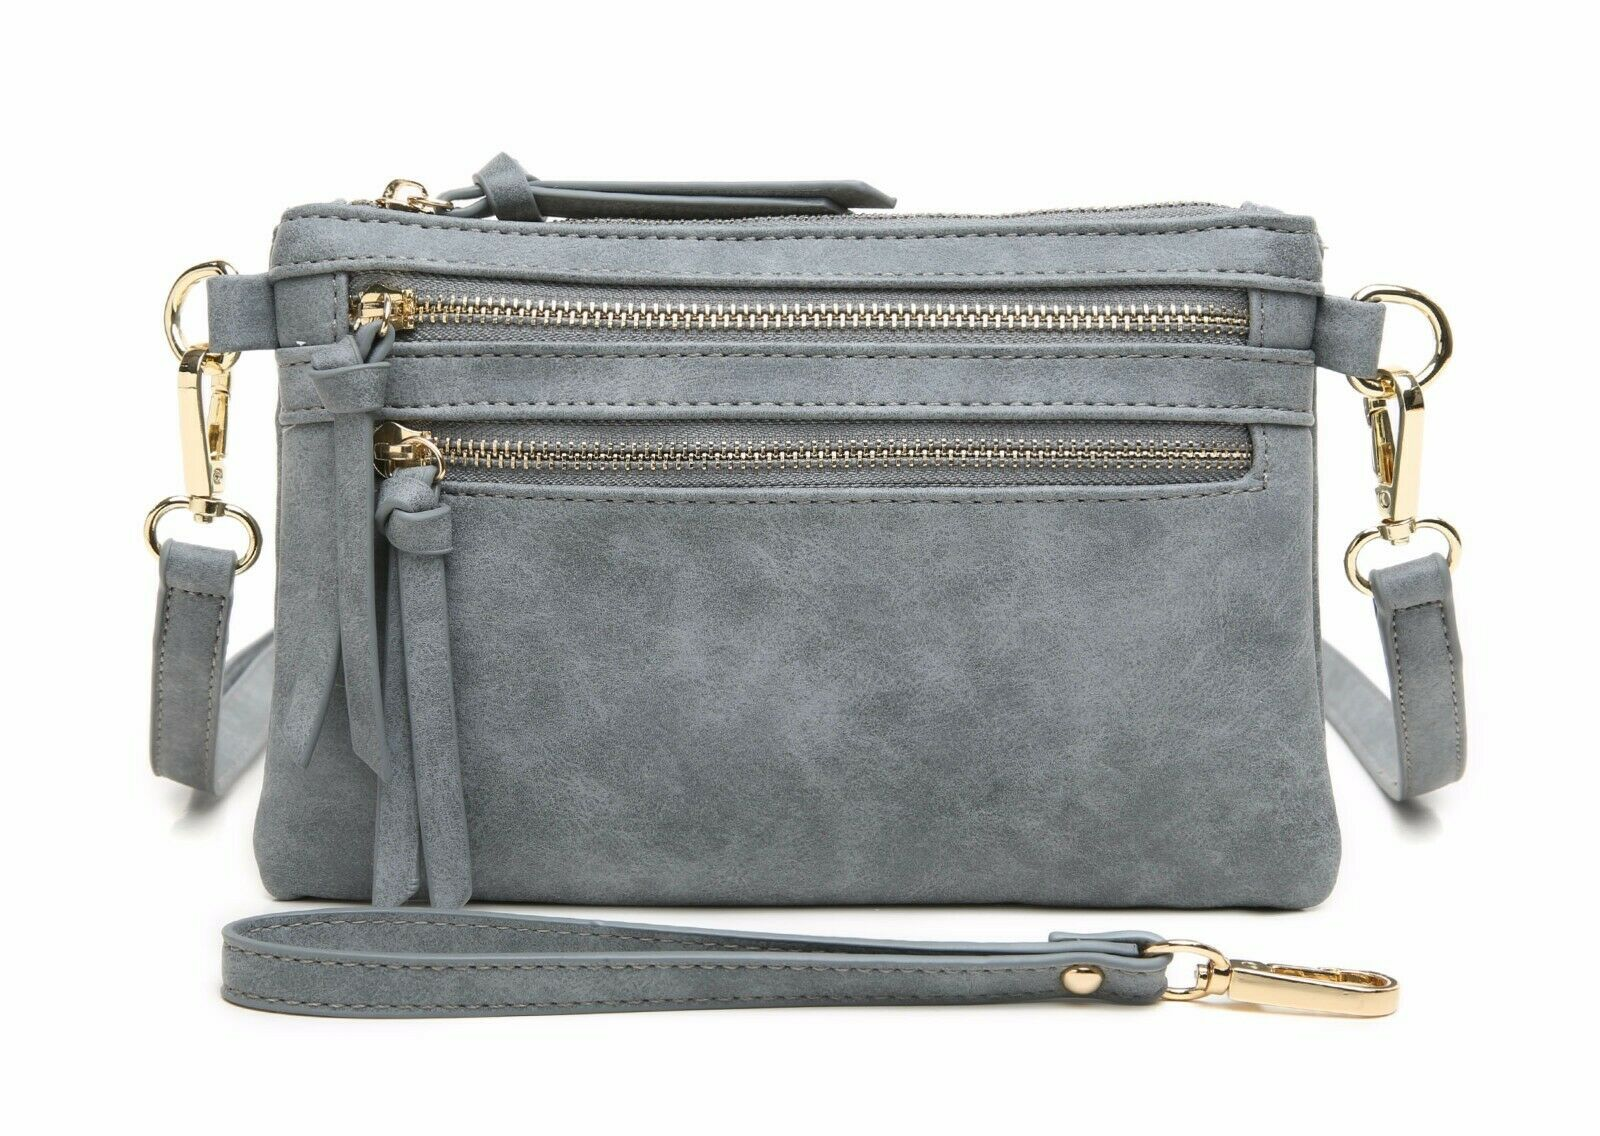 Aitbags Crossbody Bag for Women Multi Zip Pocket Clutch Purs